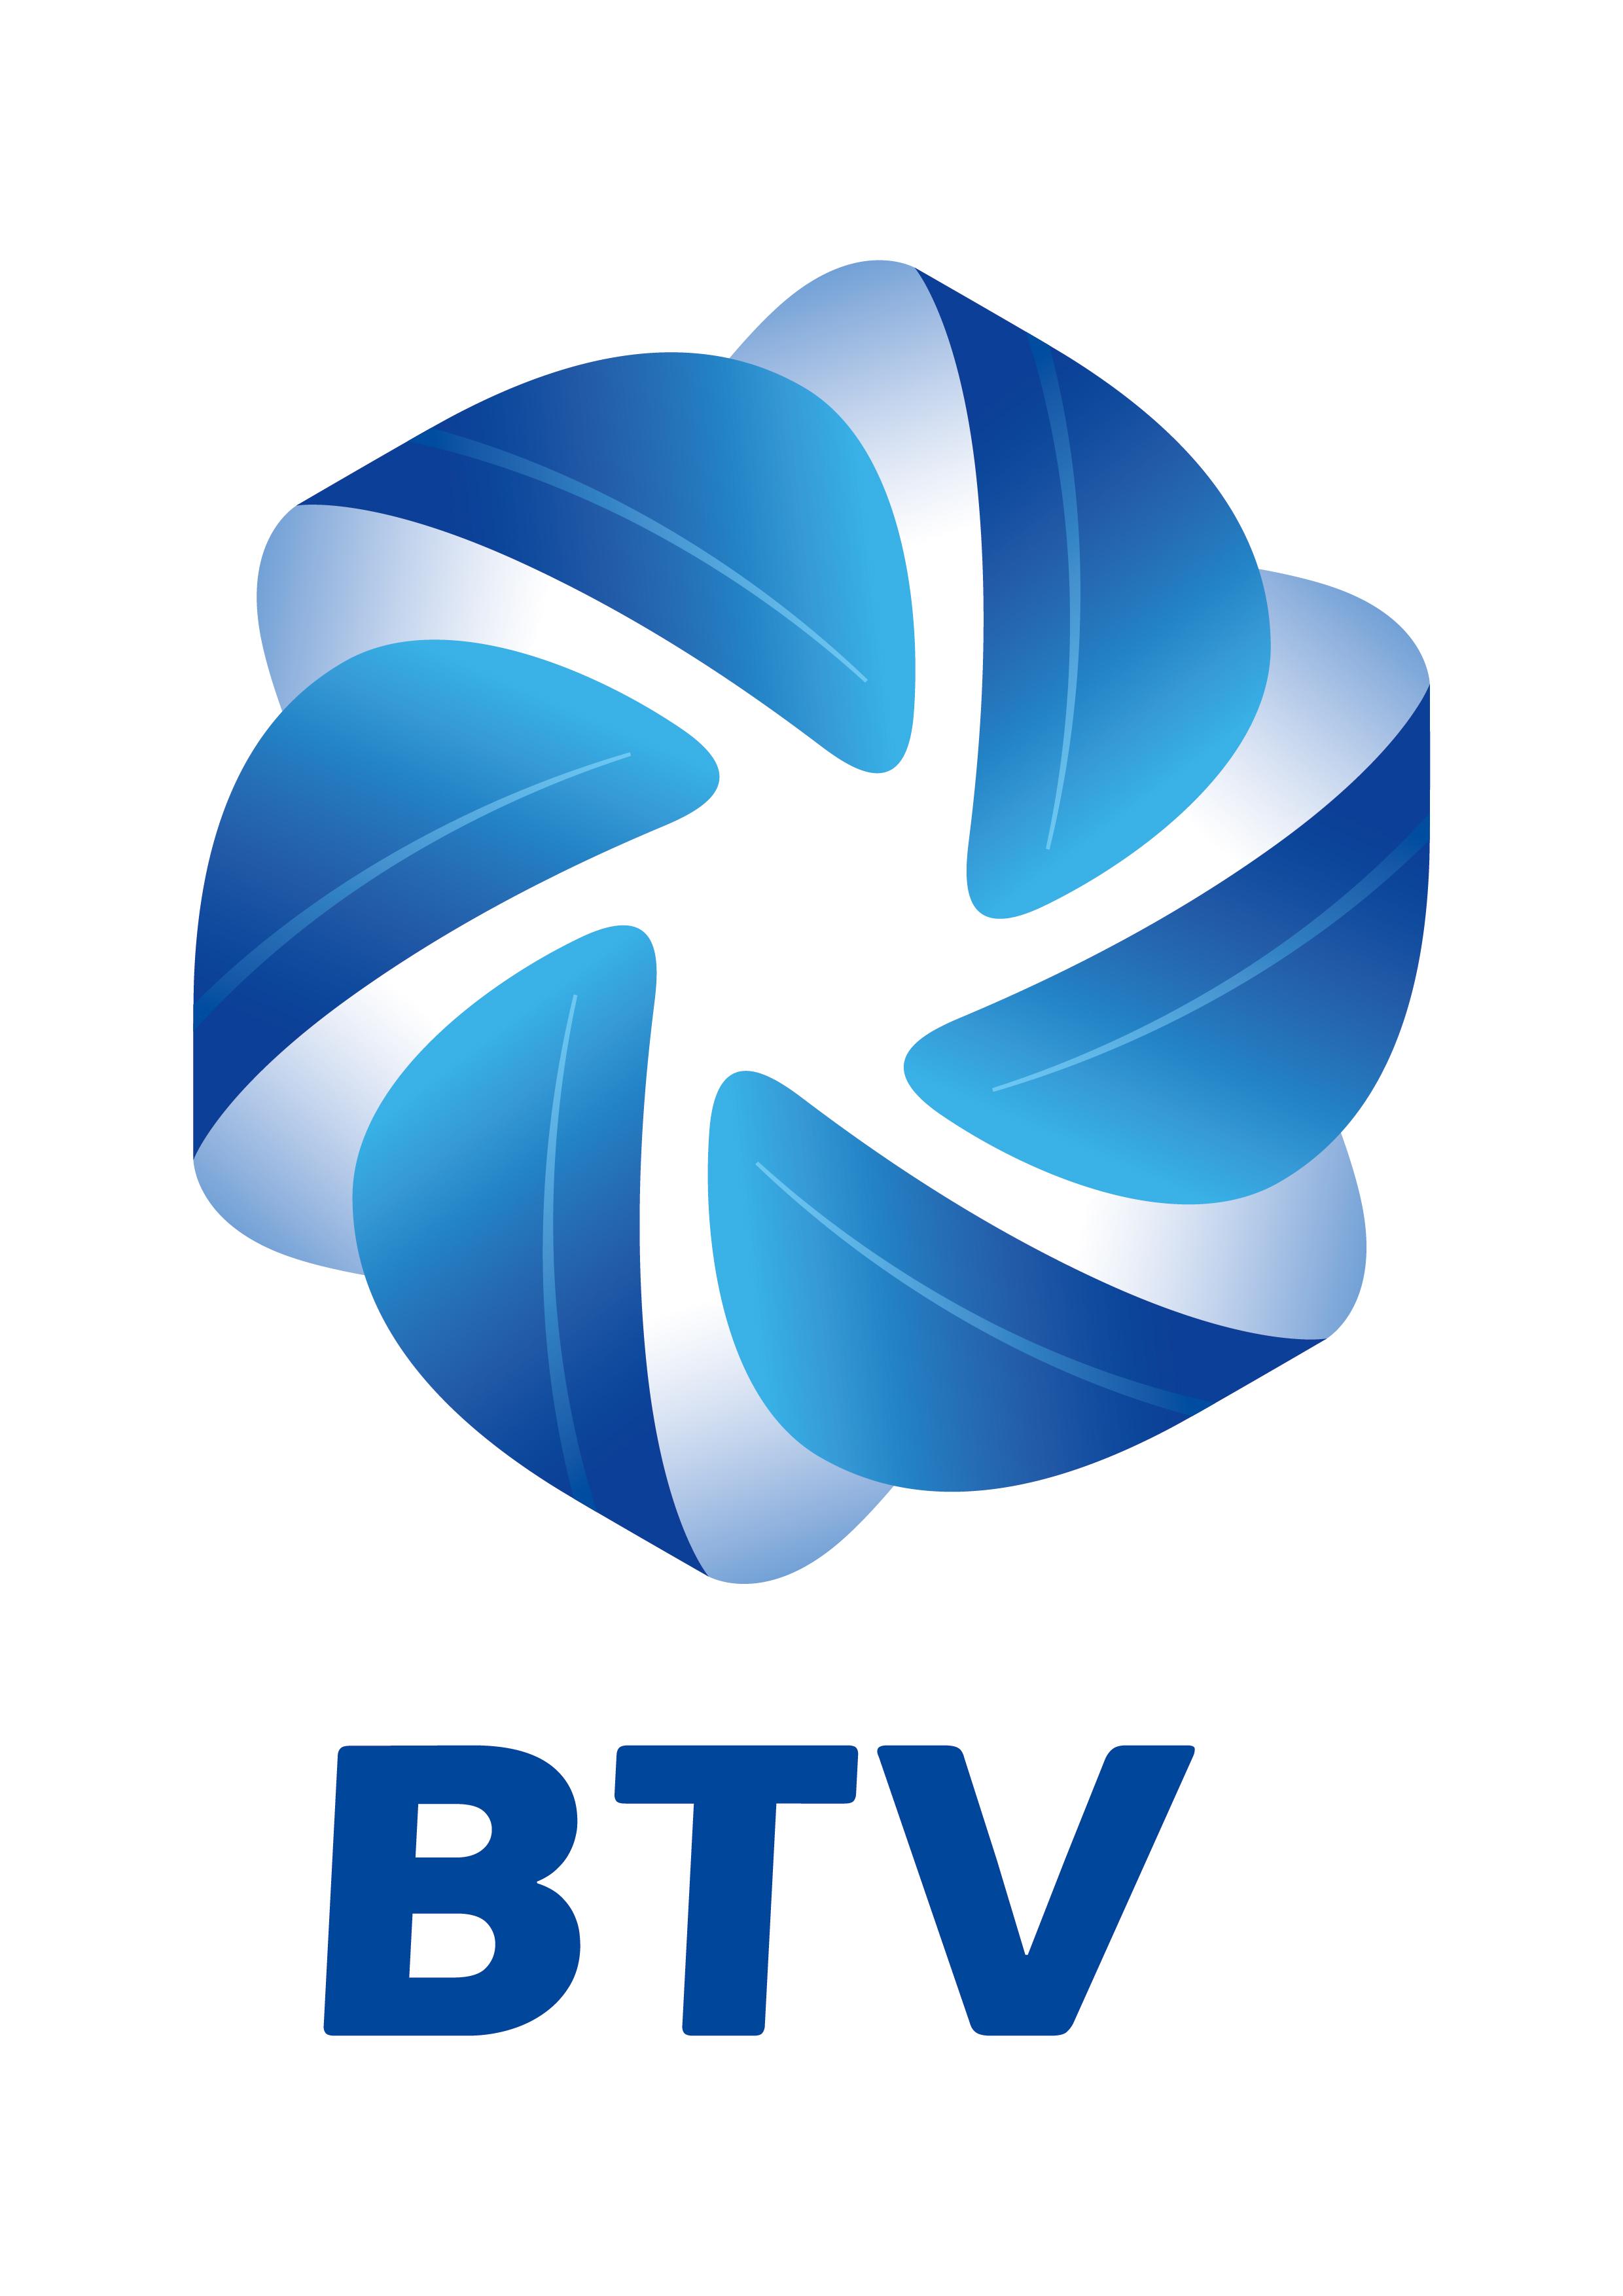 BTV_logo-01